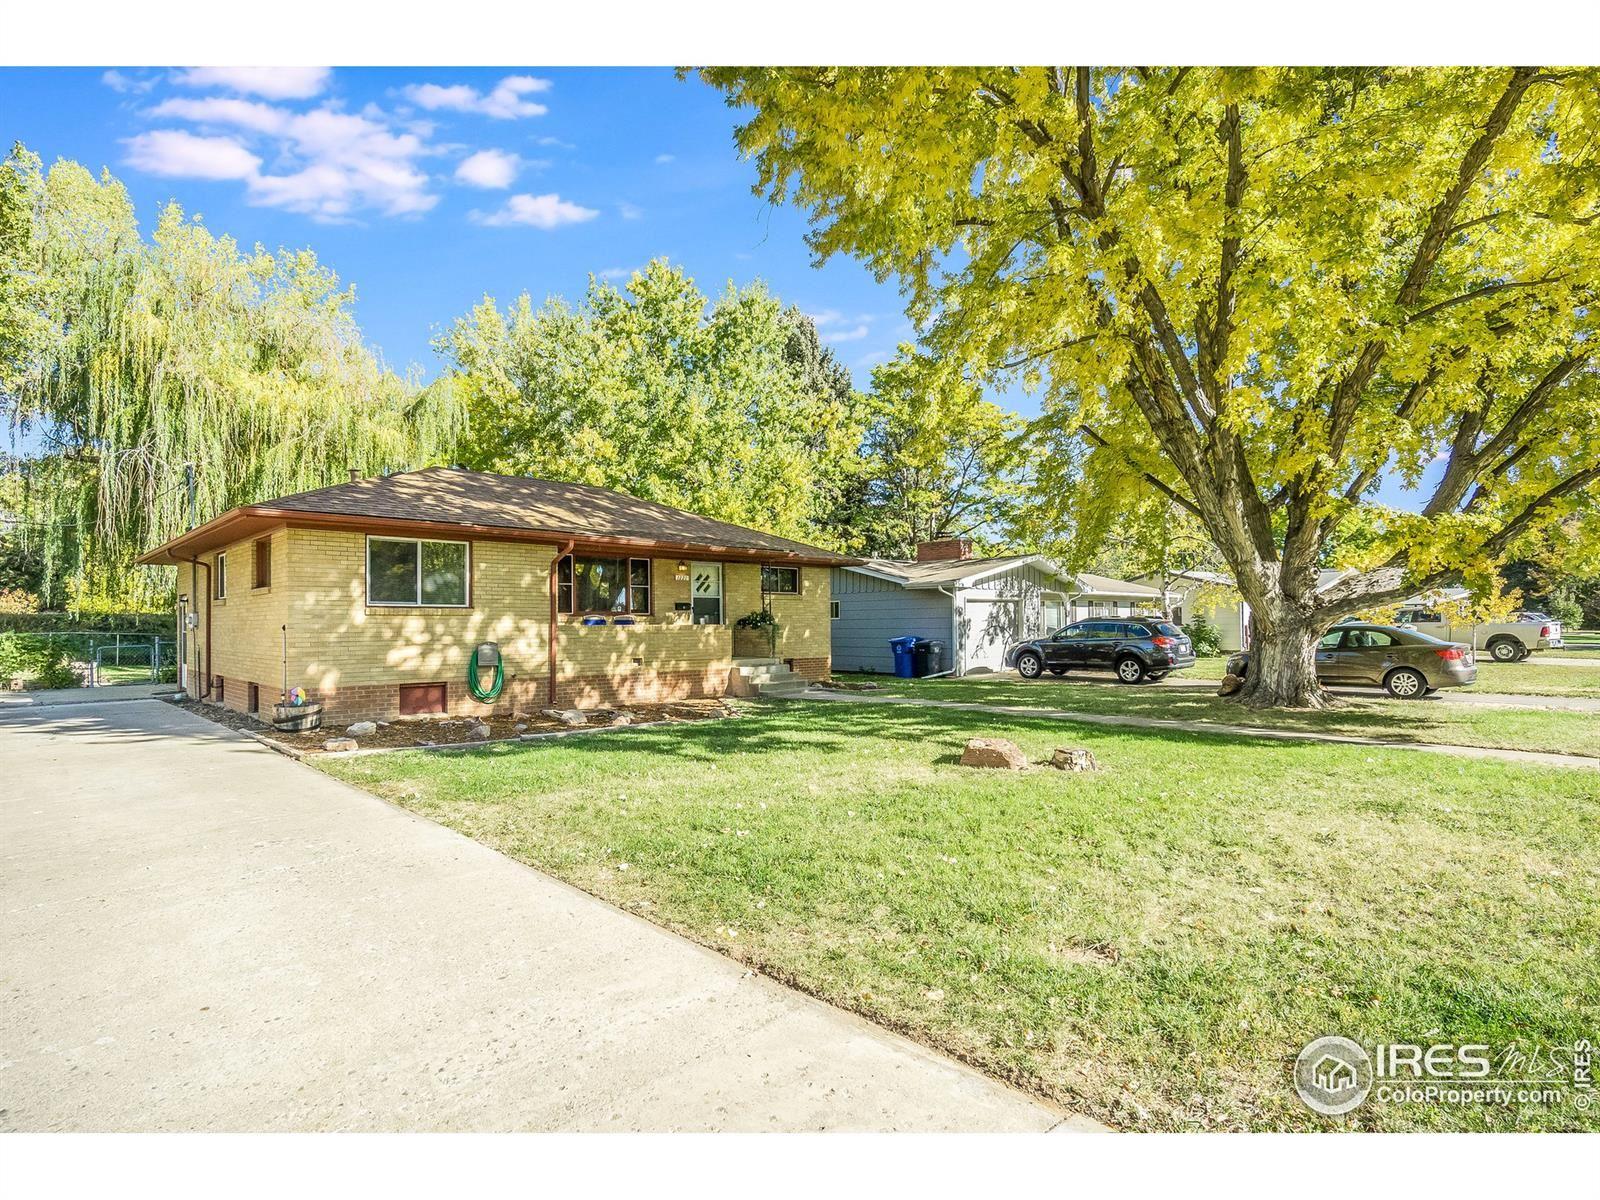 Photo of 1221 Winona Drive, Loveland, CO 80537 (MLS # IR953686)